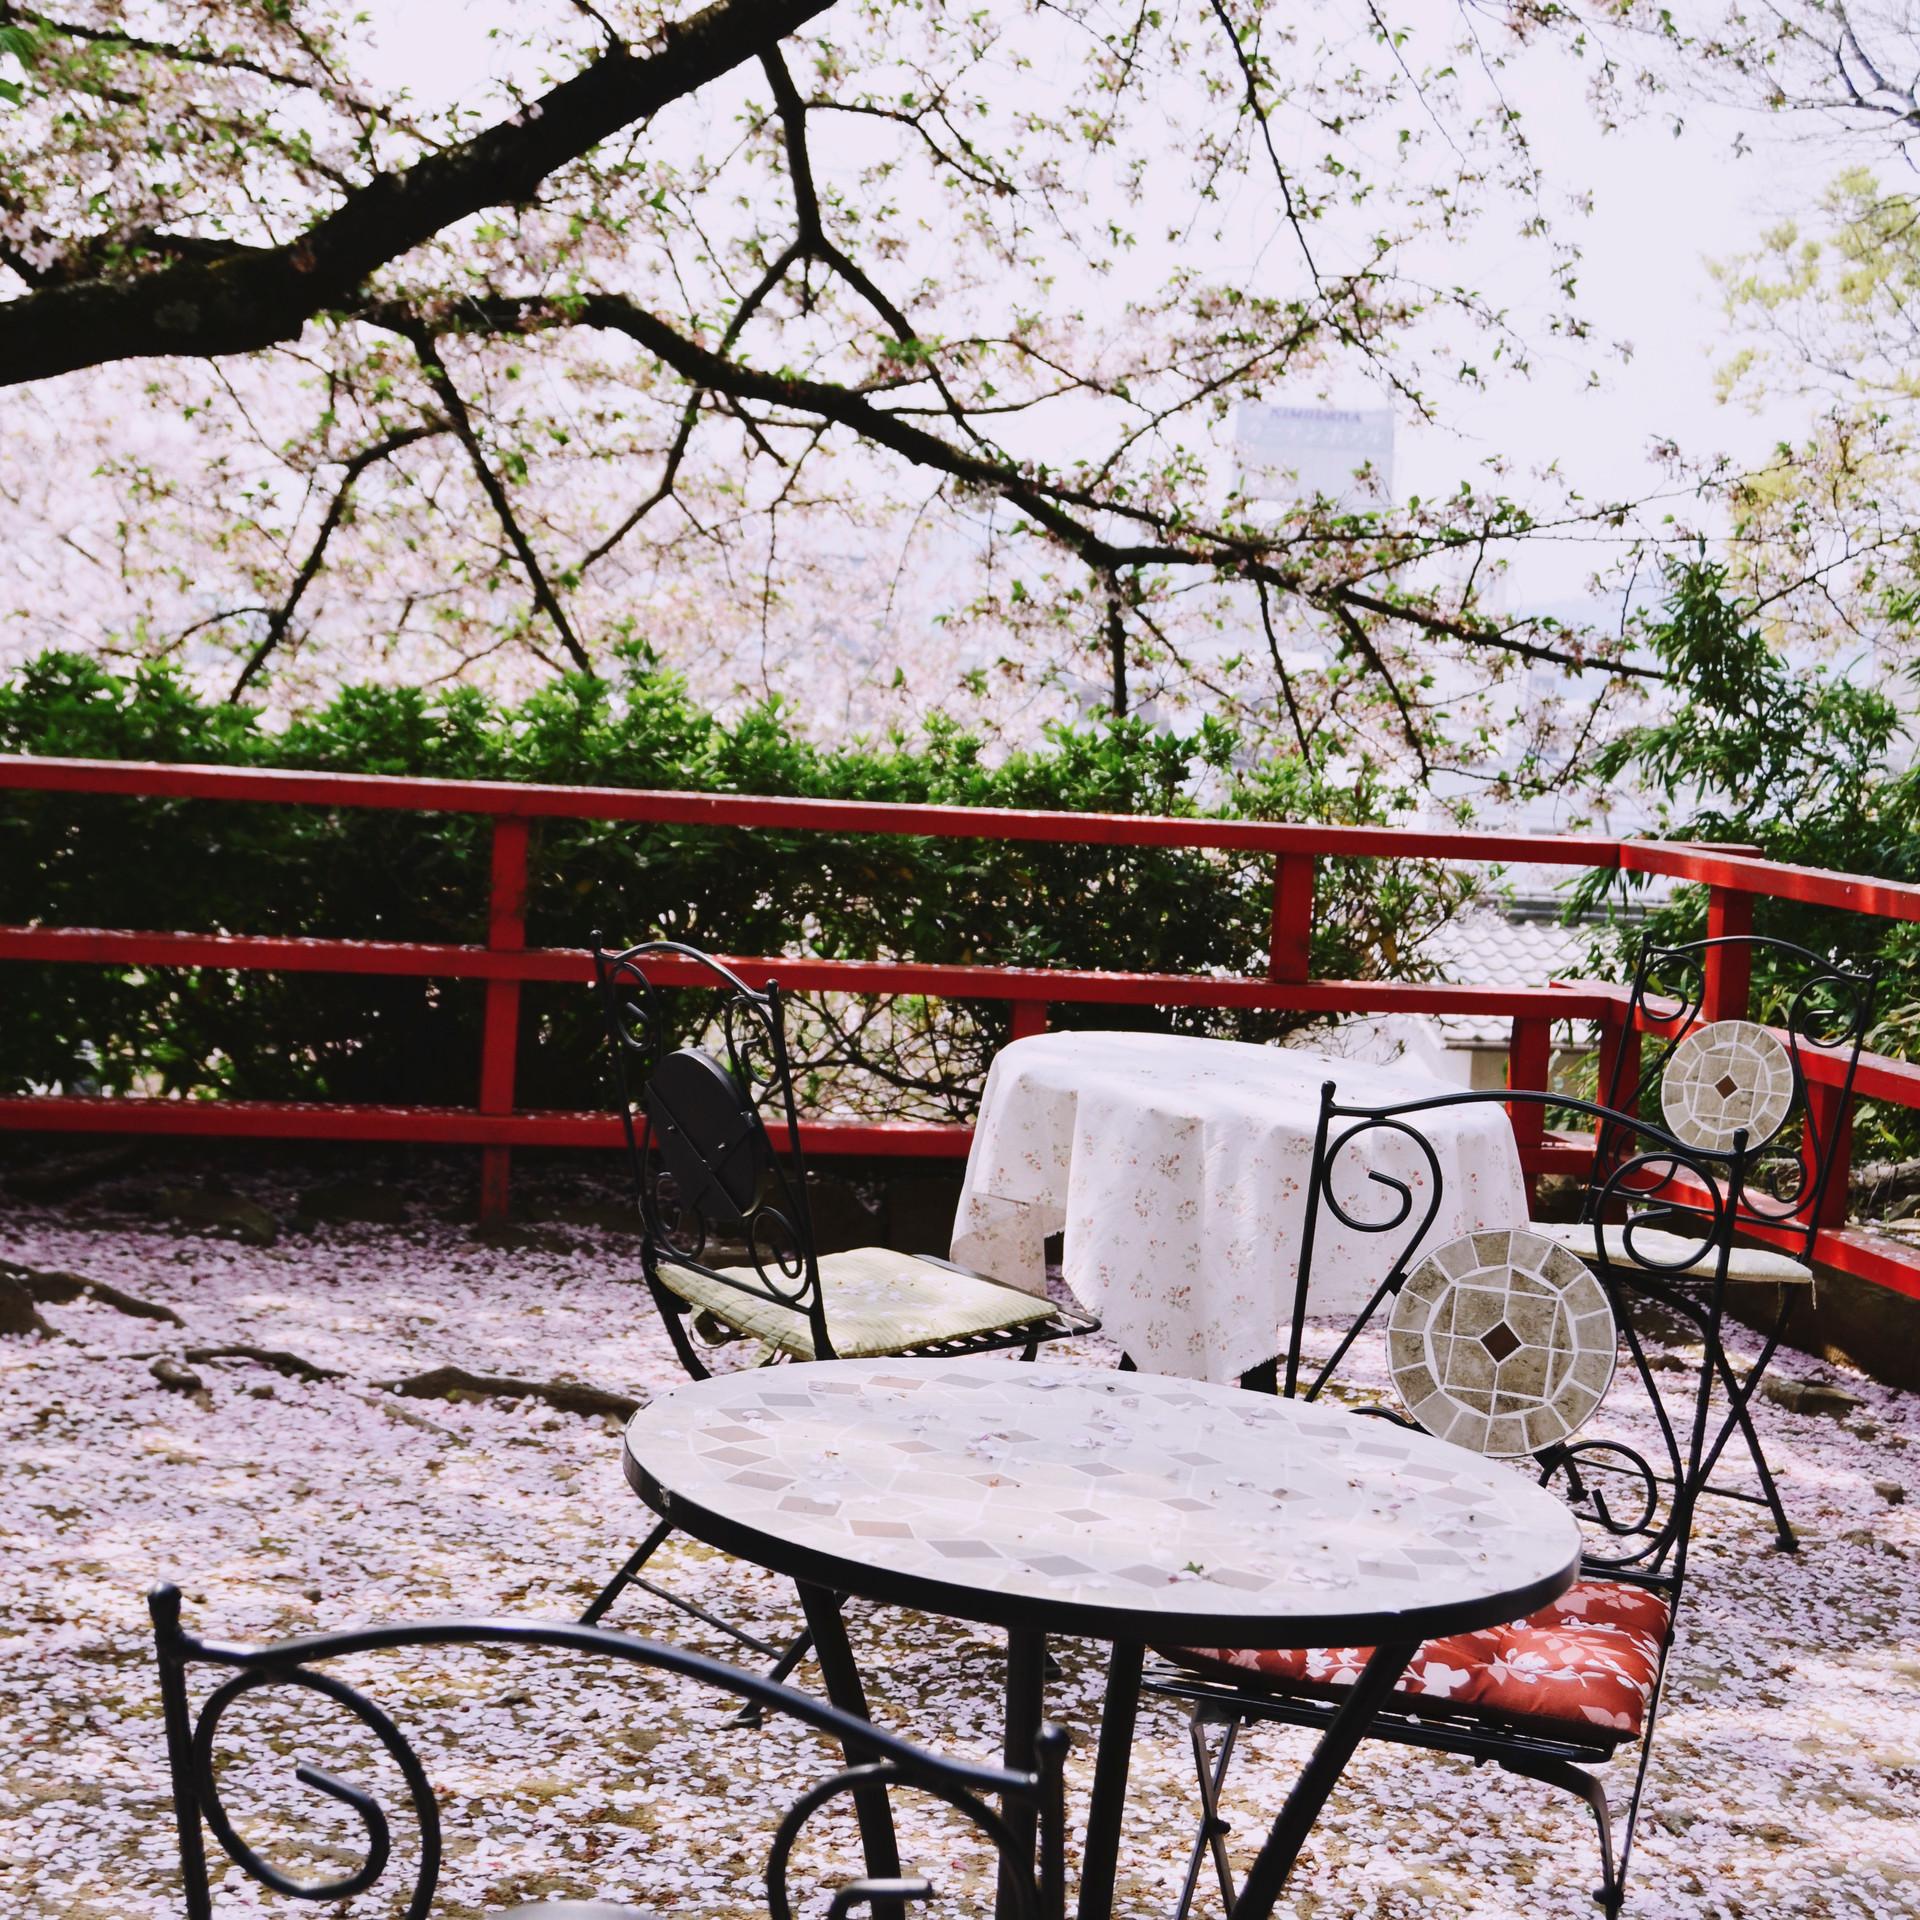 Cafe at Kimiidera.